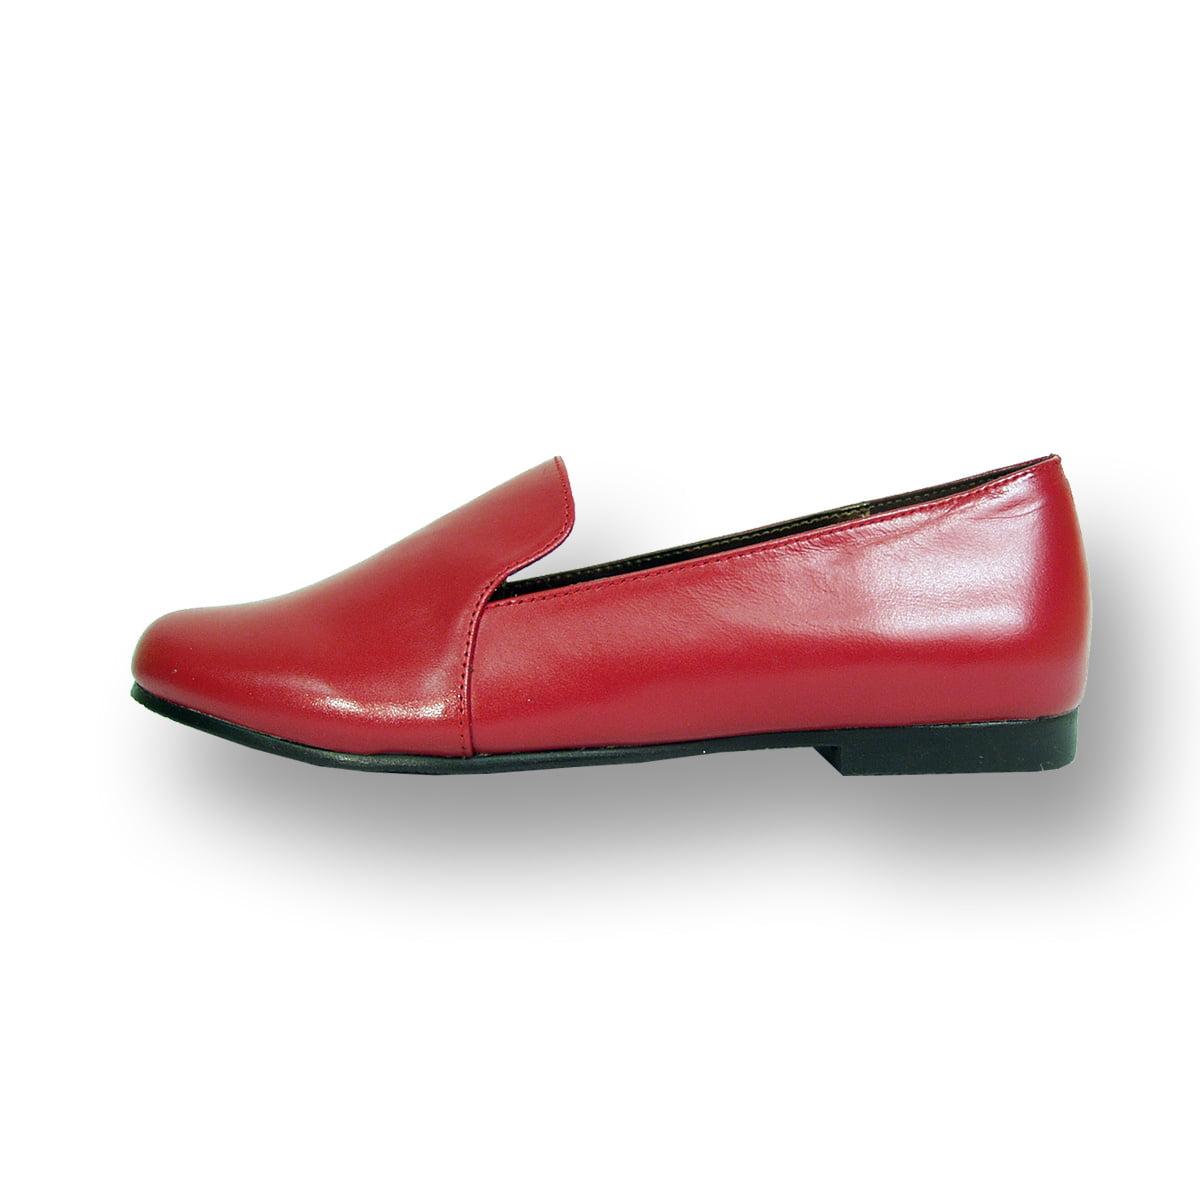 099554a5dca Peerage - PEERAGE Charlie Women Wide Width Leather Flat for Everyday Wear  RED 8.5 - Walmart.com